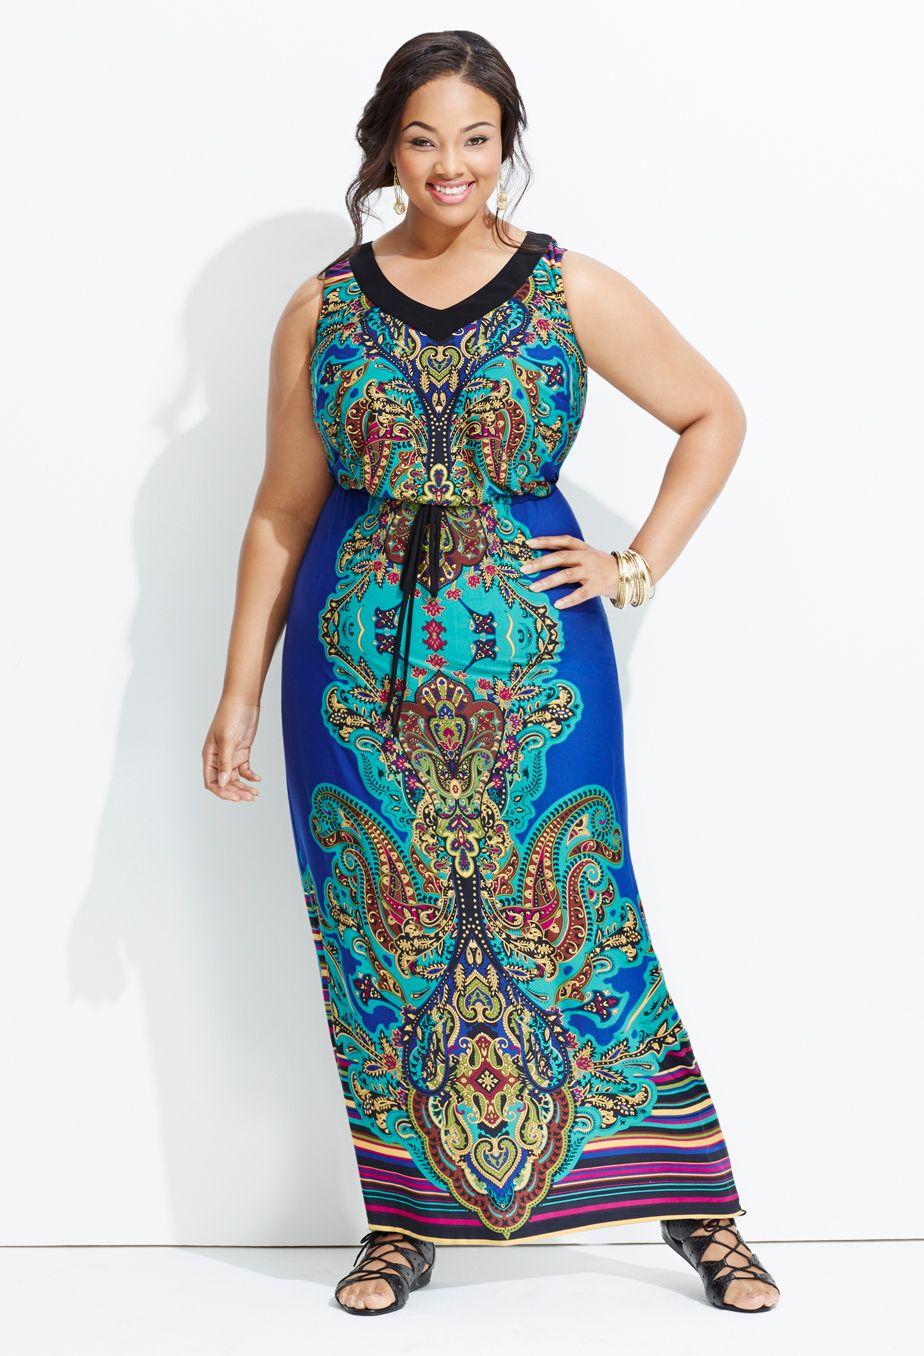 Plus Size Blue Paisley Maxi Dress Plus Size Maxi Dresses Avenue Plus Size Outfits Plus Size Fashion Paisley Maxi Dress [ 1356 x 924 Pixel ]